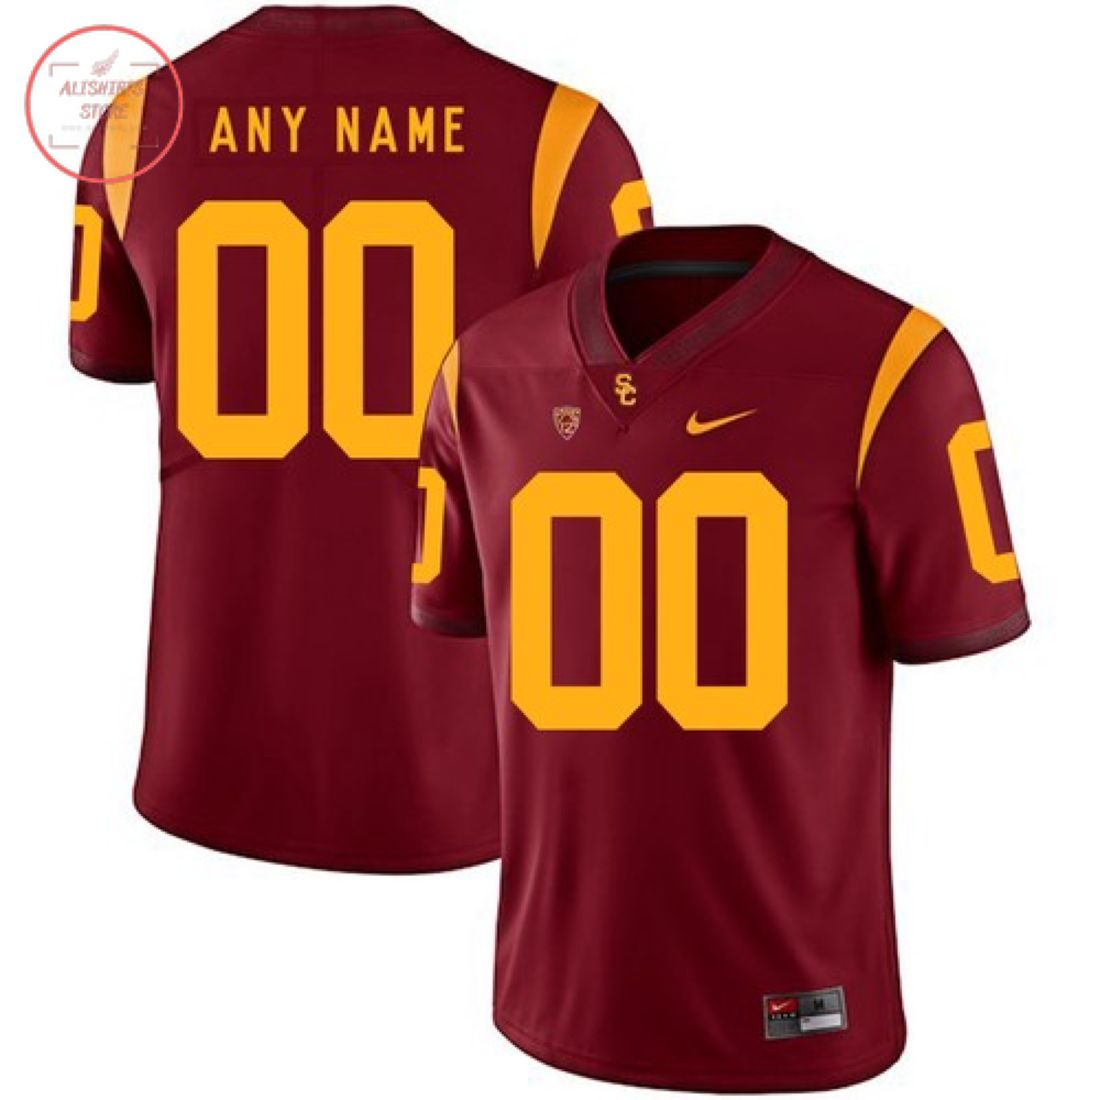 USC Trojans Custom Name Number Football Jersey